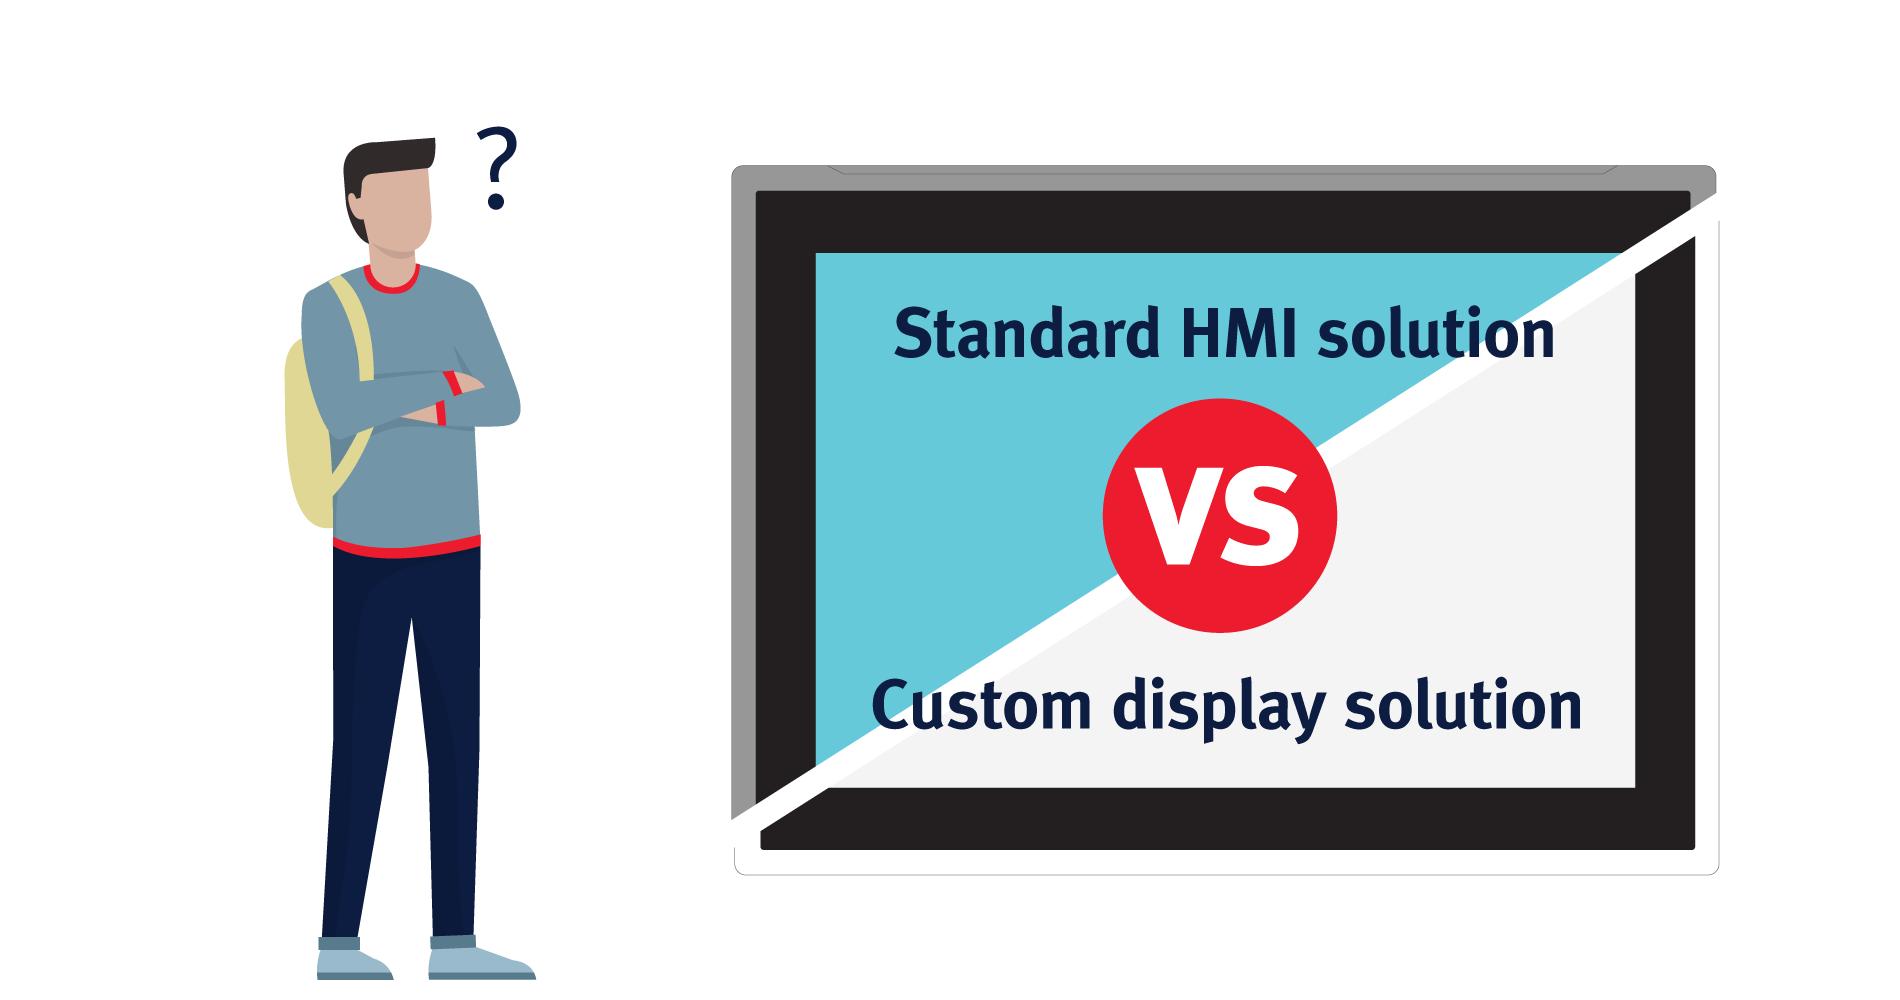 2020_Beijer_Illustration_HMI-Digital-Display-Solution_1900x1000